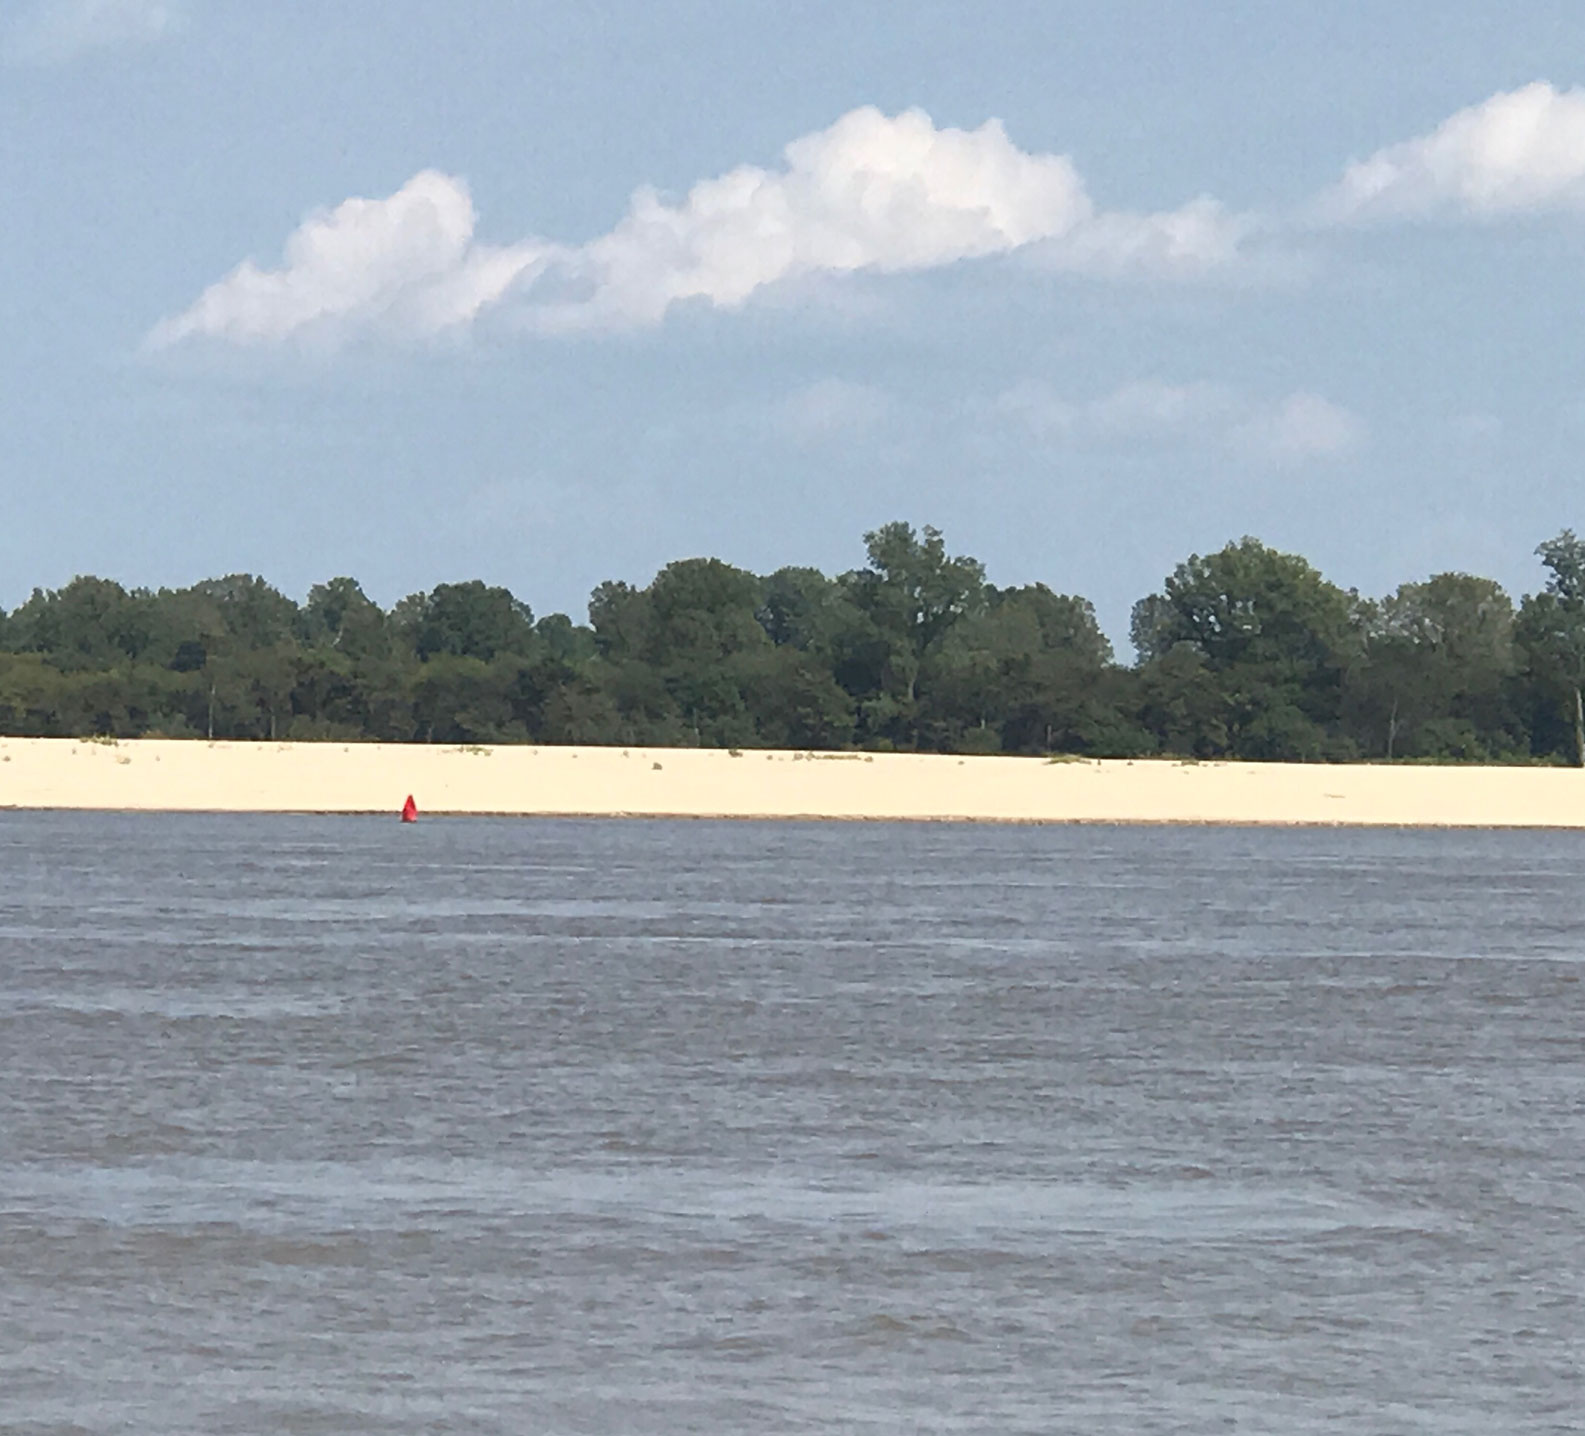 Sandbar along the Mississippi River